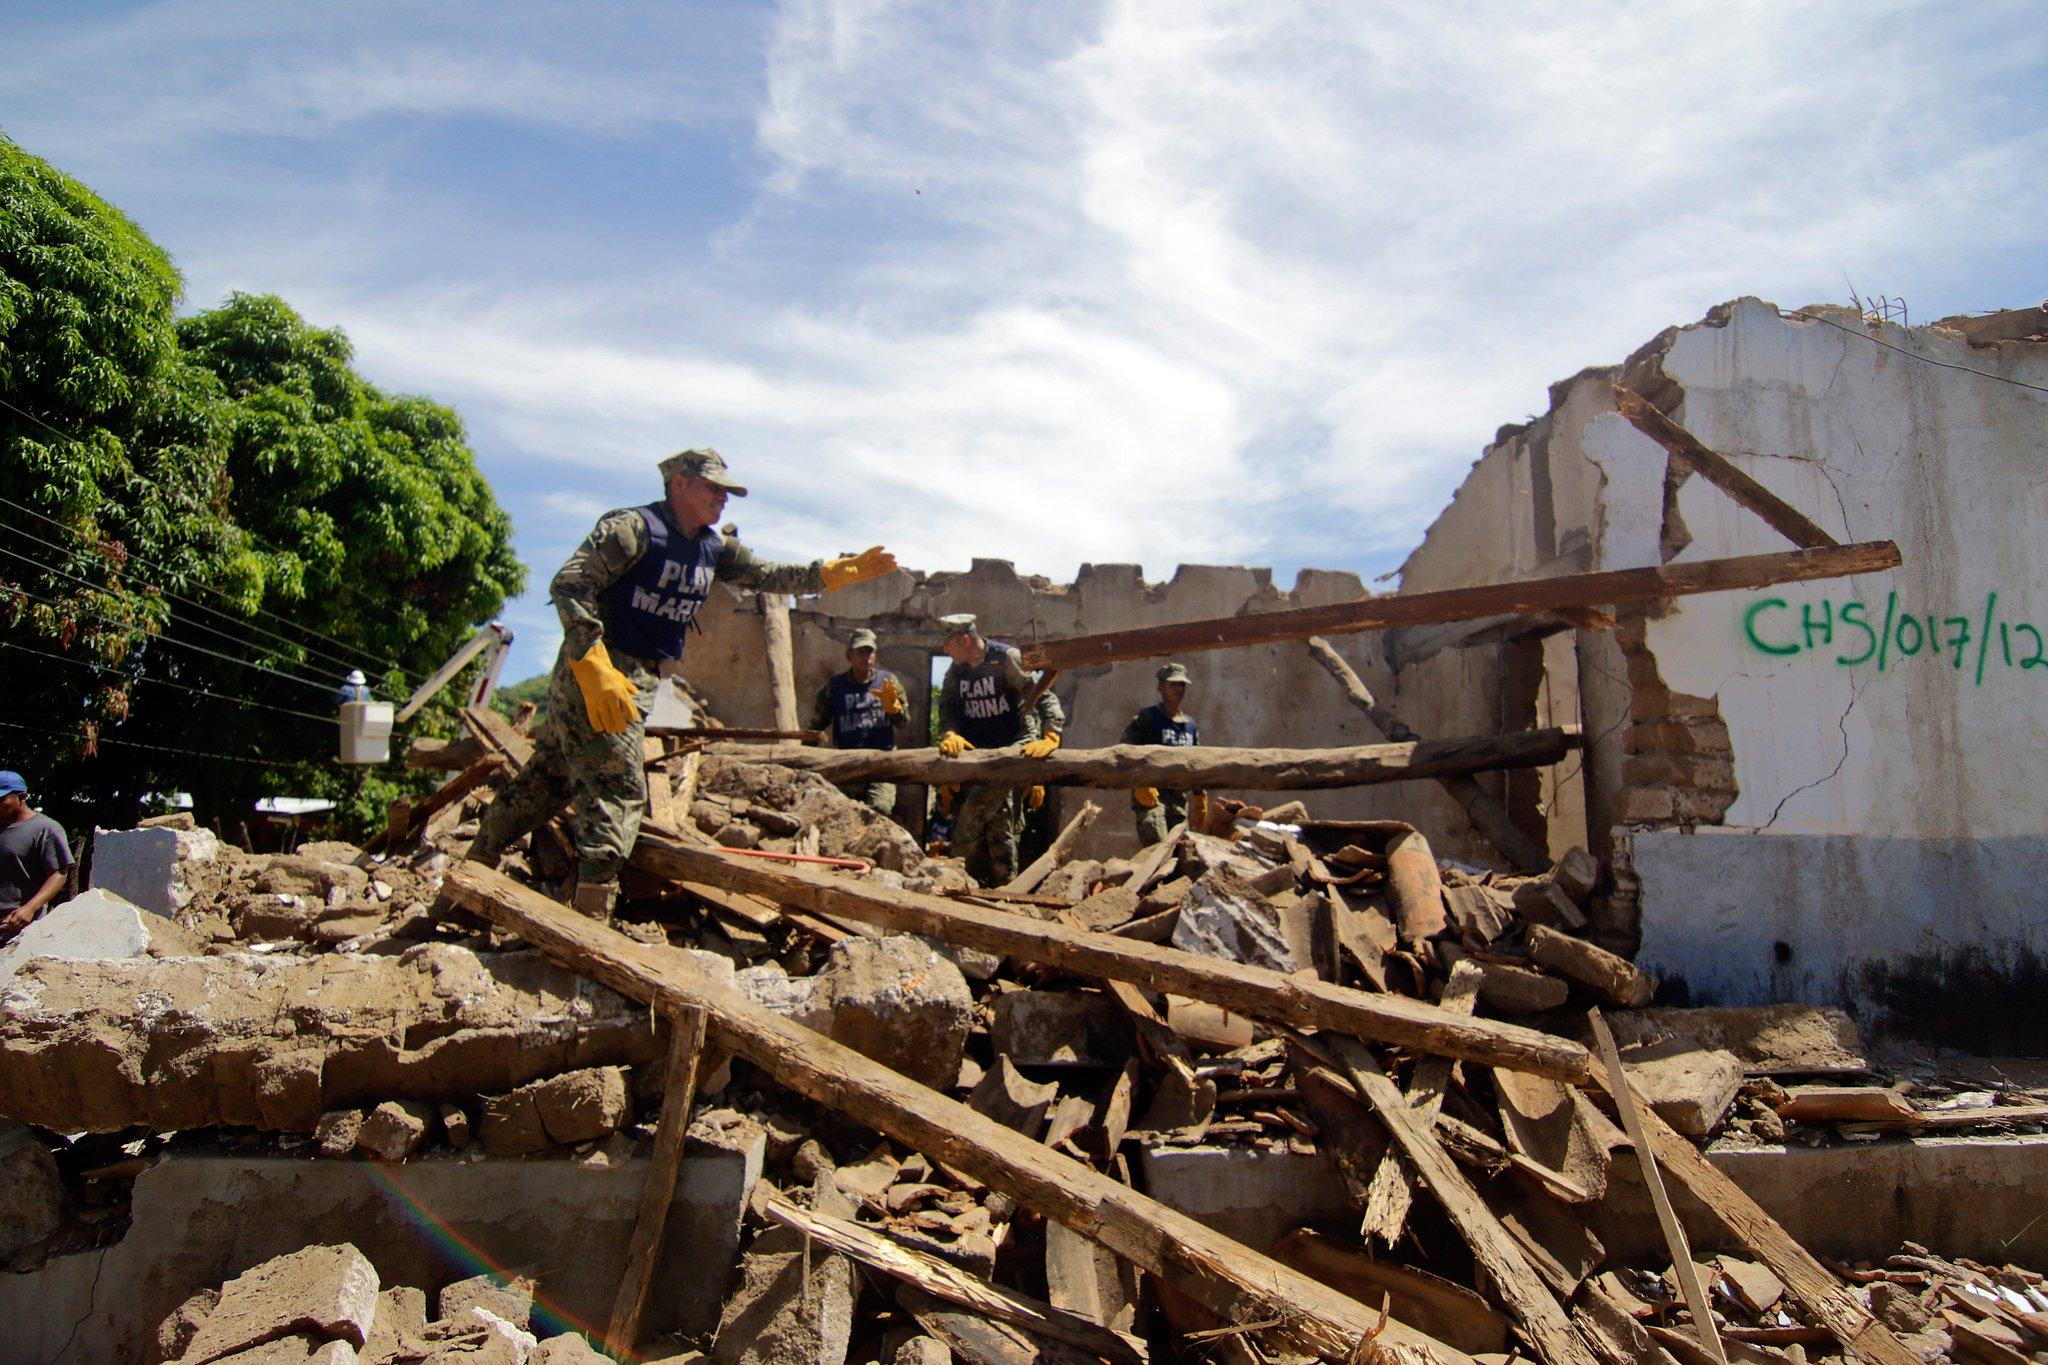 Se registró nuevo #sismo de 5.8 en #Chiapas https://t.co/CigtRlQzbD https://t.co/OdDBLmXPgk